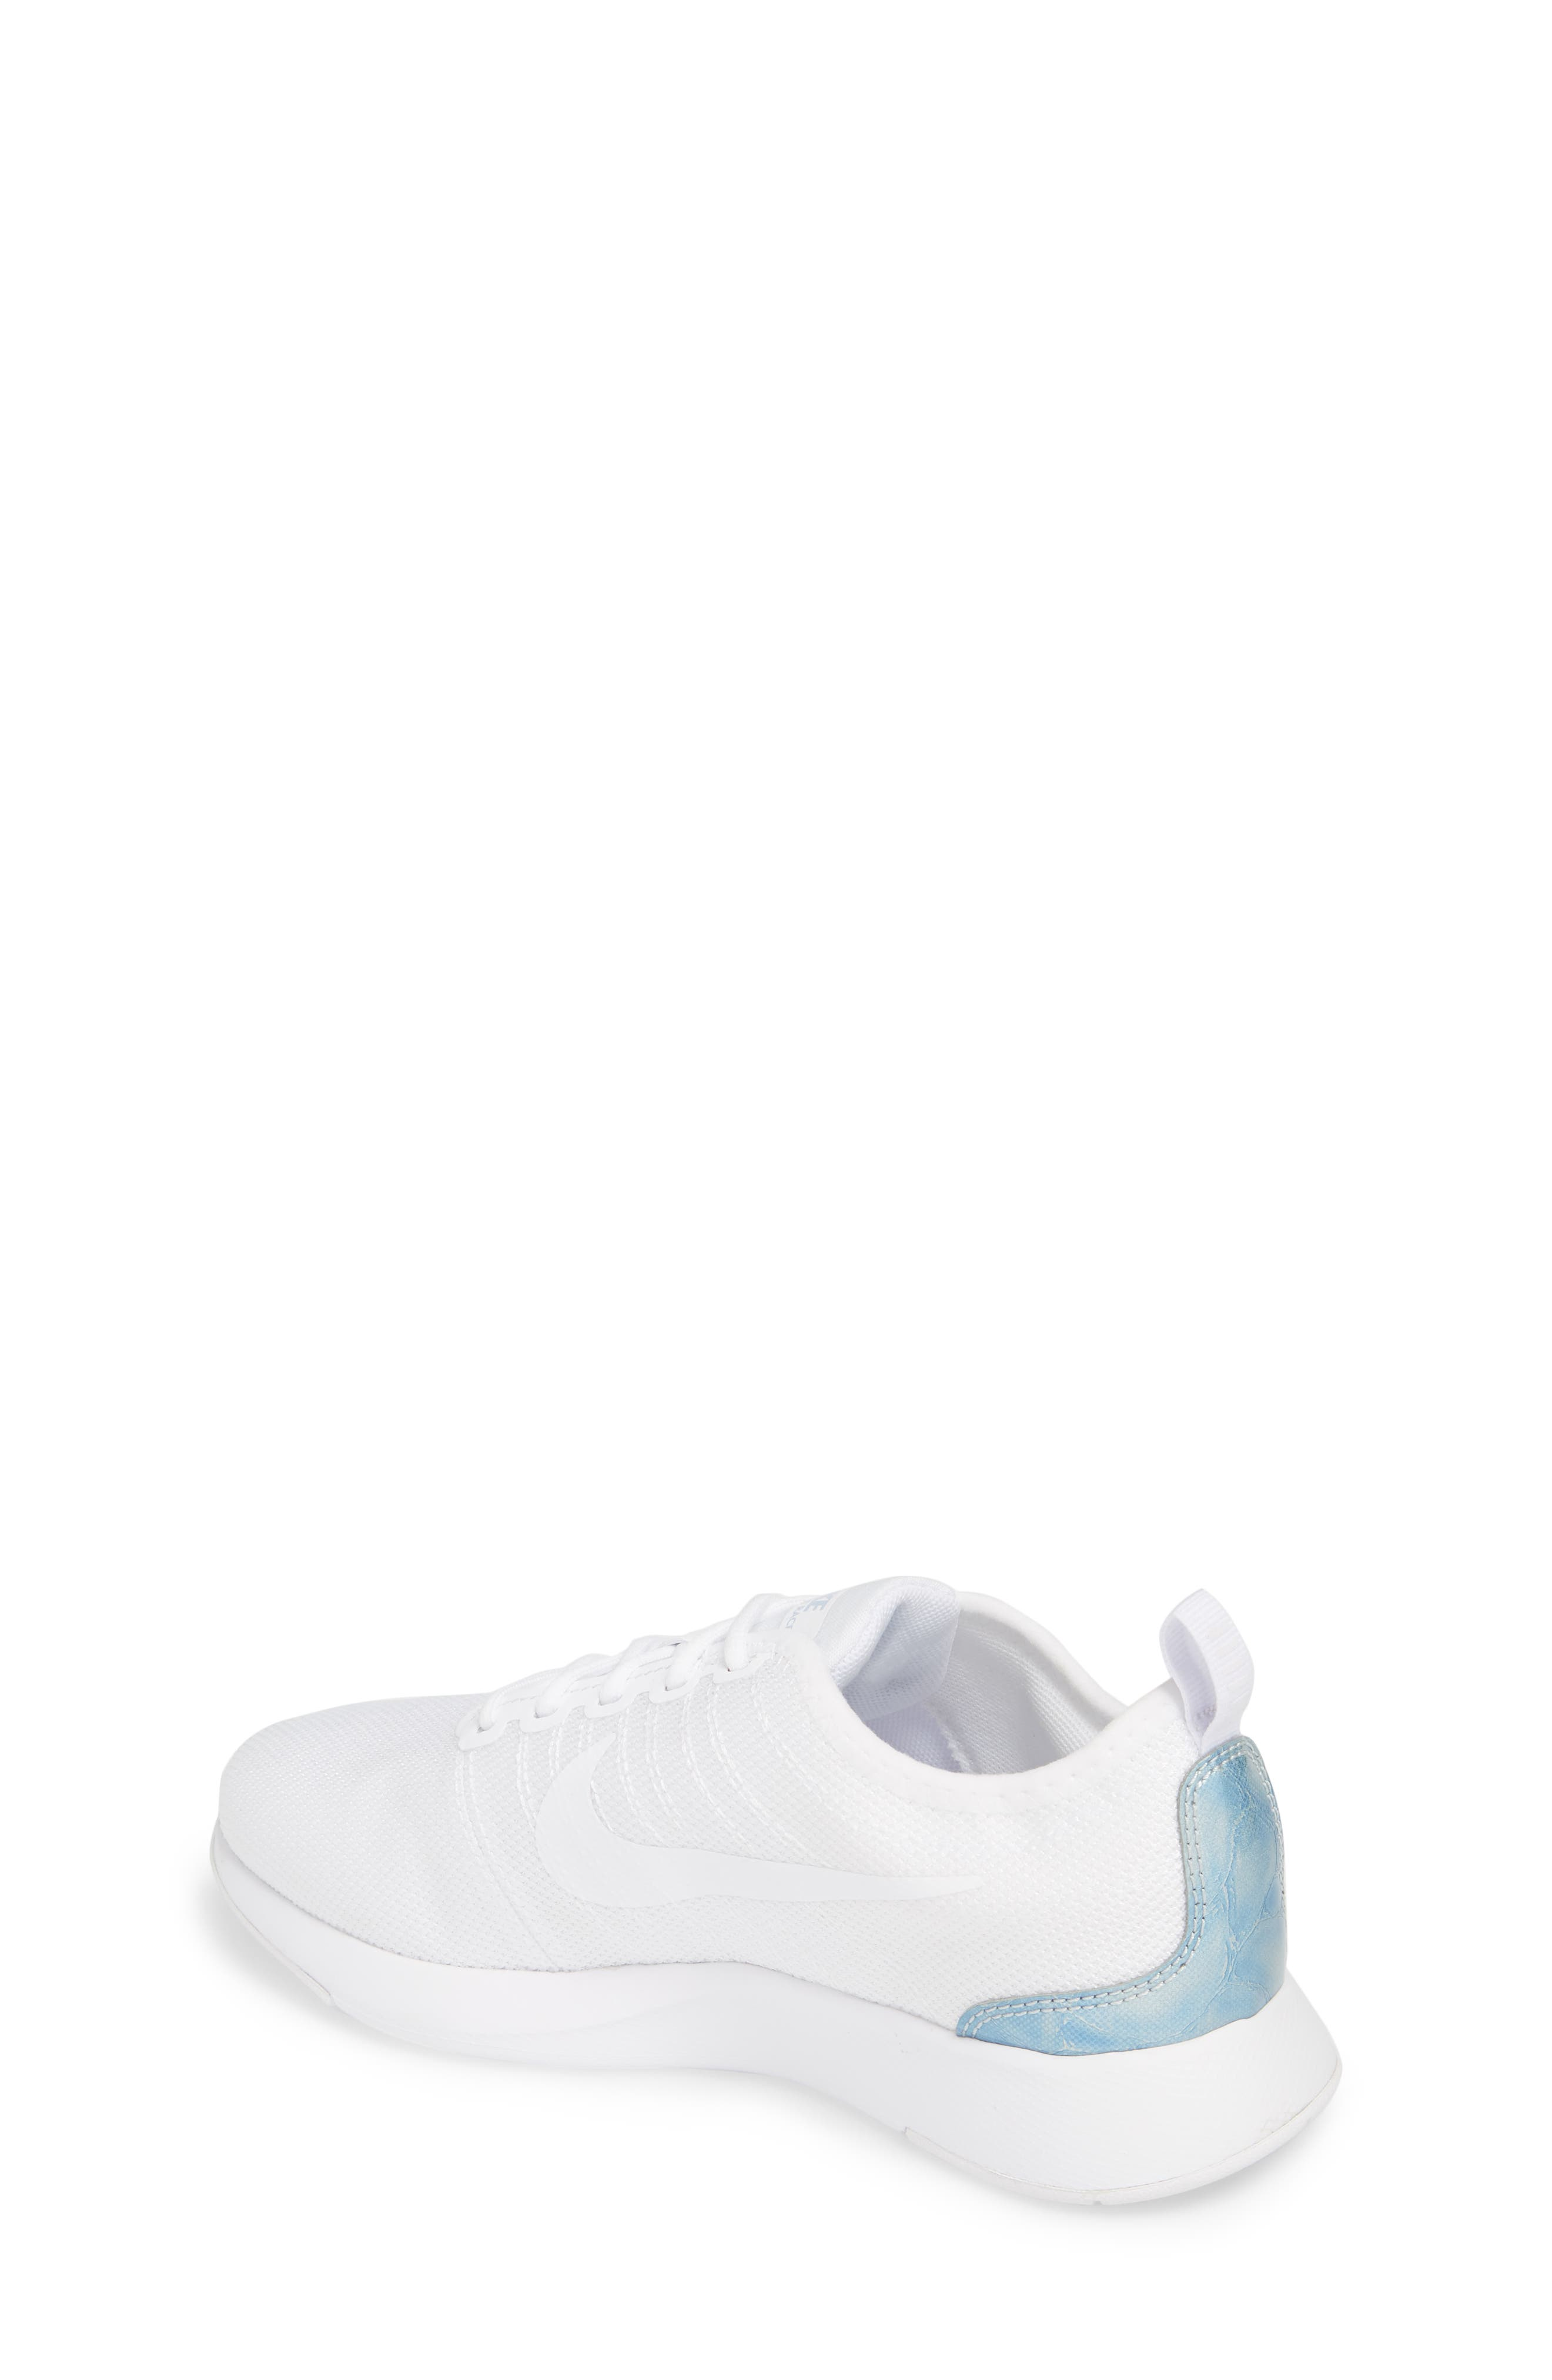 Dualtone Racer GS Sneaker,                             Alternate thumbnail 8, color,